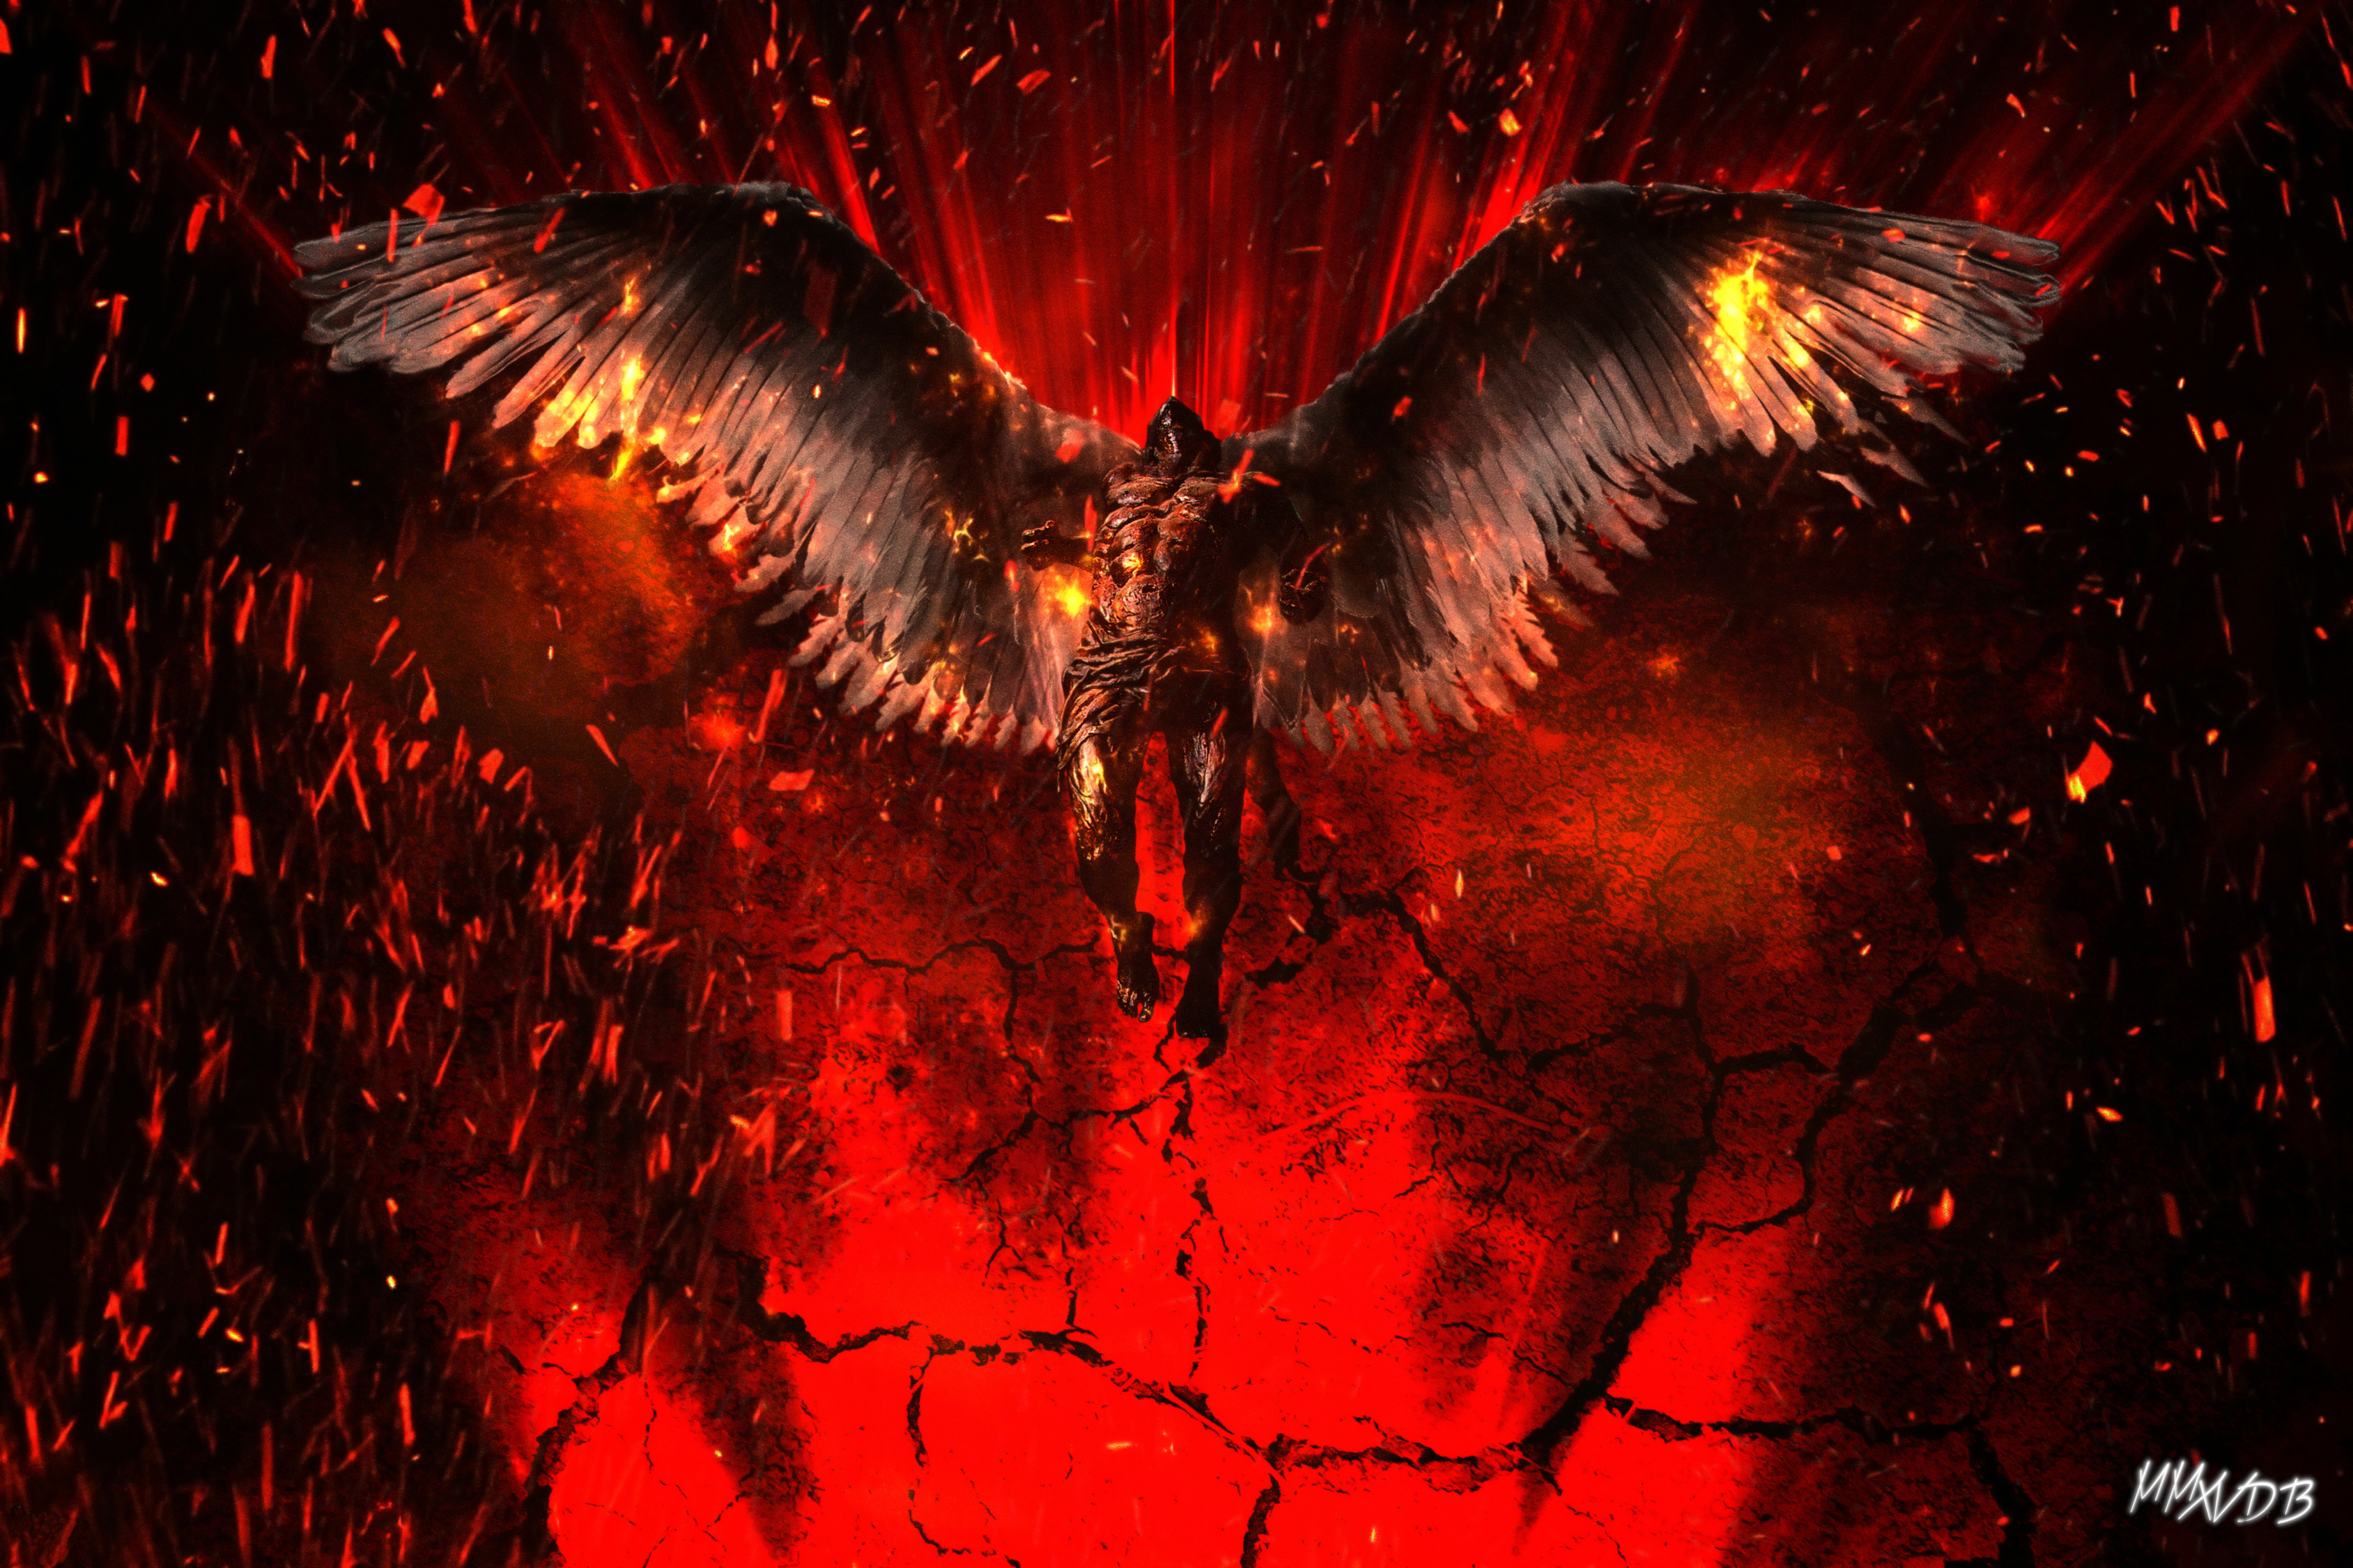 lucifer tv series art 1578252546 - Lucifer Tv Series Art - Lucifer Tv series 4k wallpaper, Lucifer 4k wallpaper